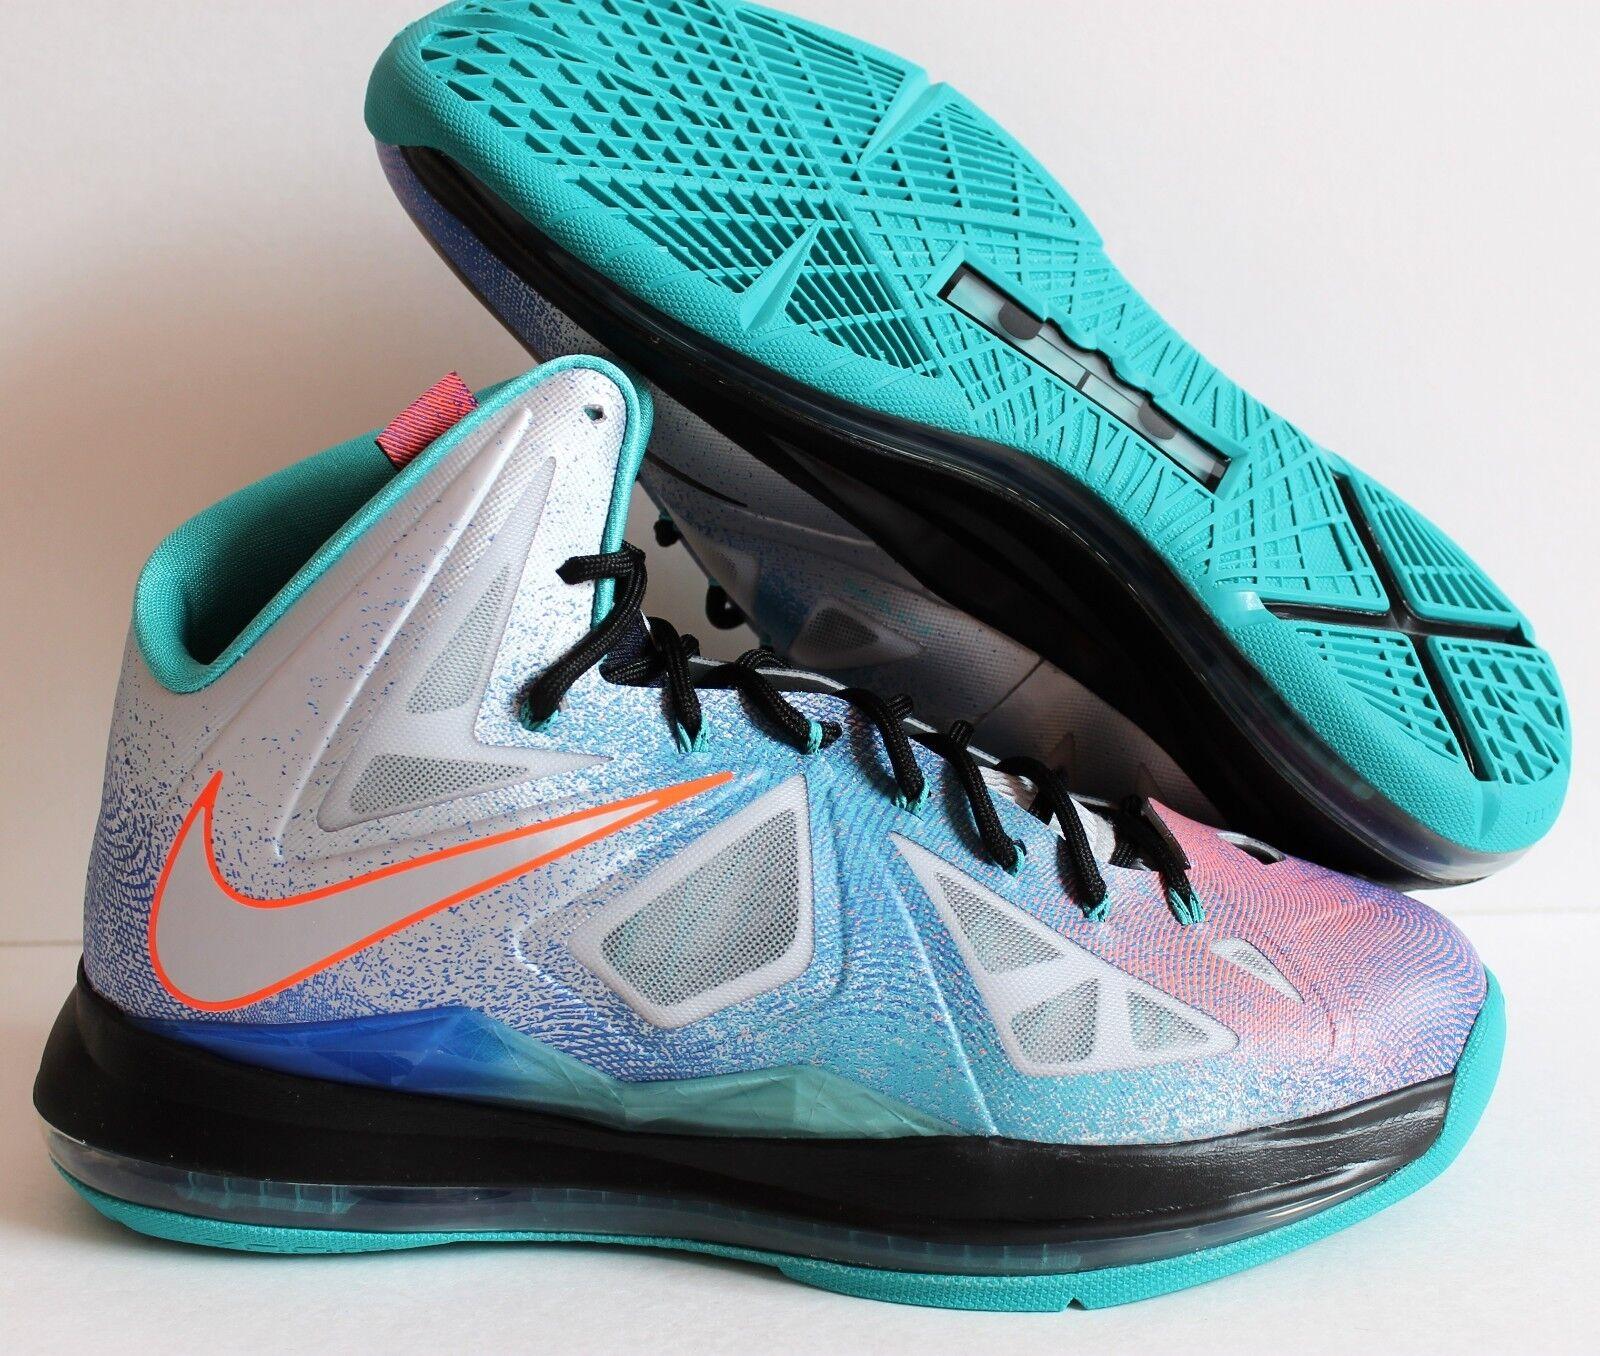 Nike lebron 10 x 8 puro platinum-nero-sport turq sz 8 x [541100 008. 175128